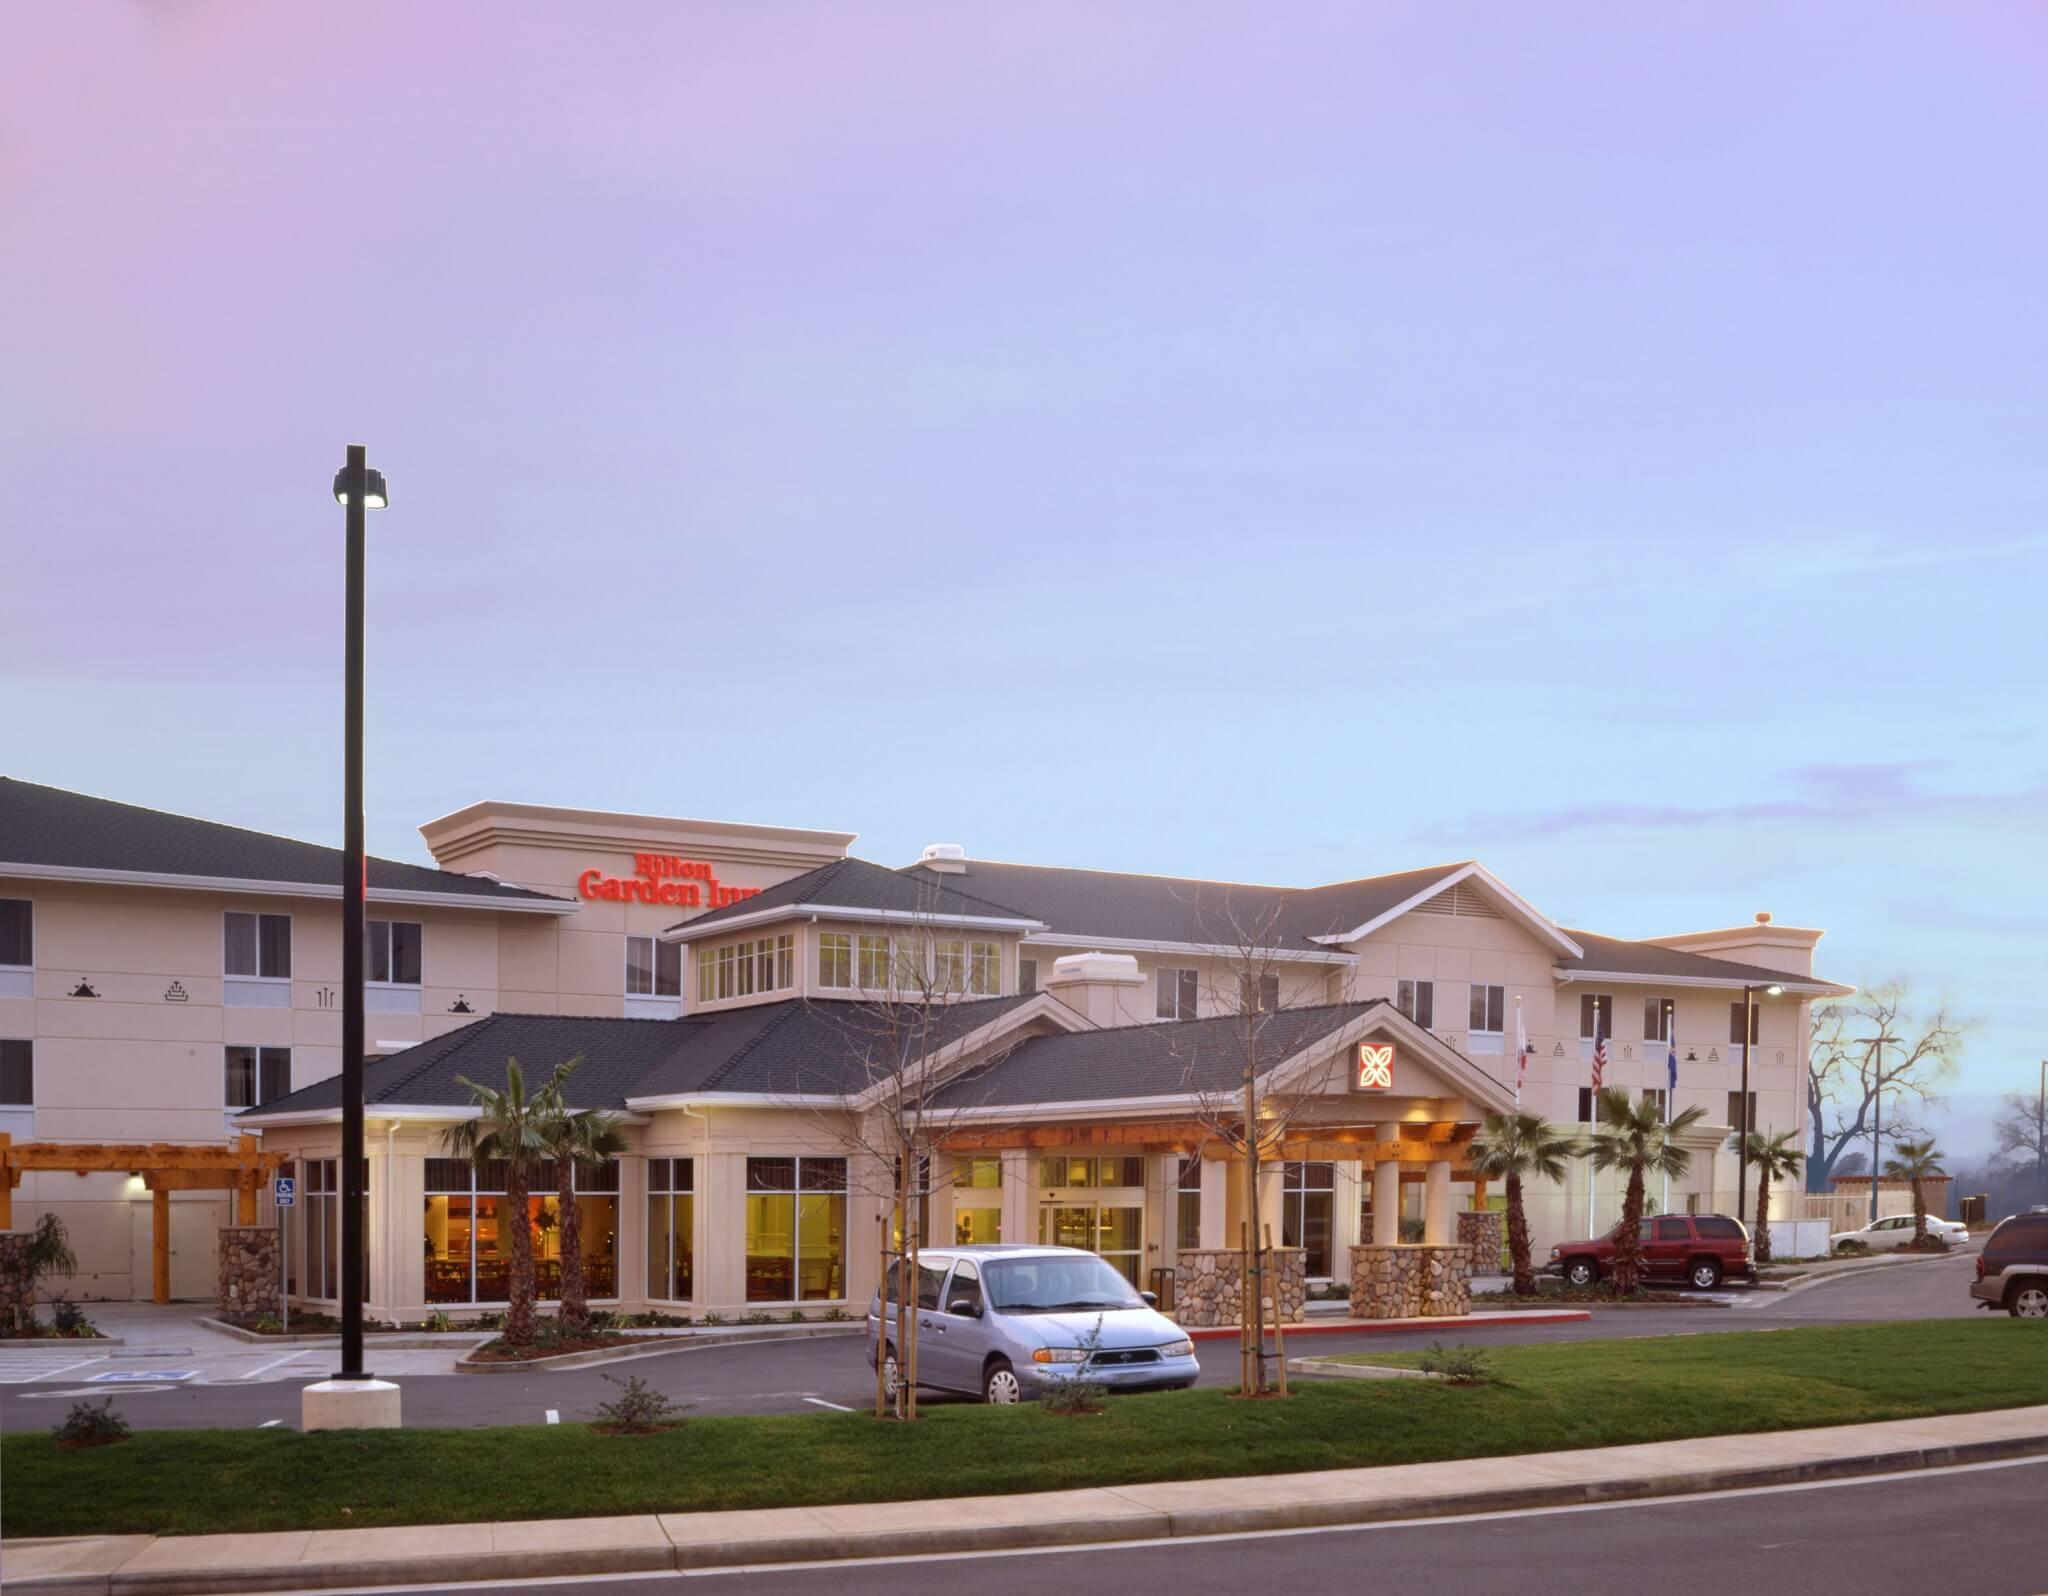 Amazing Hilton Garden Inn | Redding, CA Good Looking